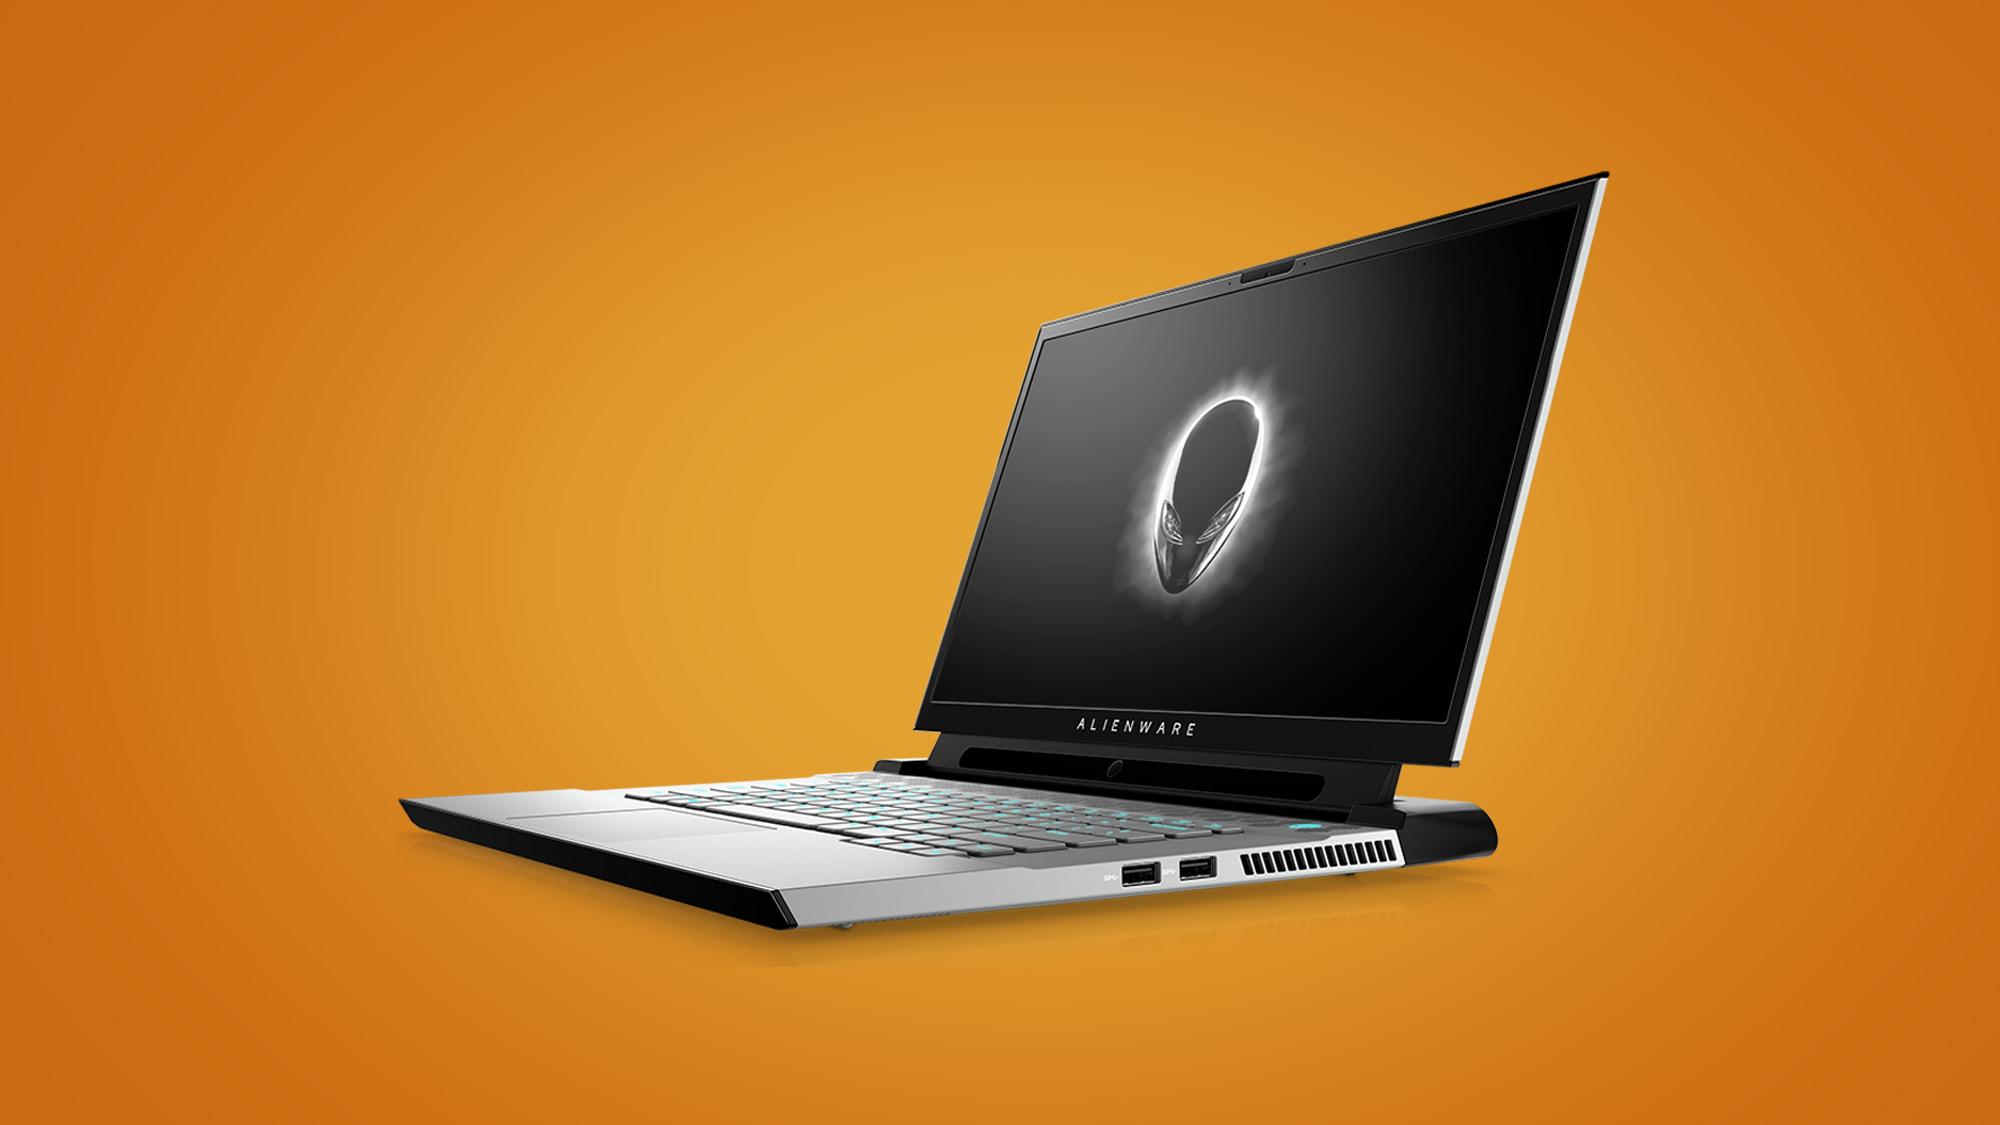 Best Black Friday Laptop Deals 2021 The best cheap gaming laptop deals under $1000 in September 2020